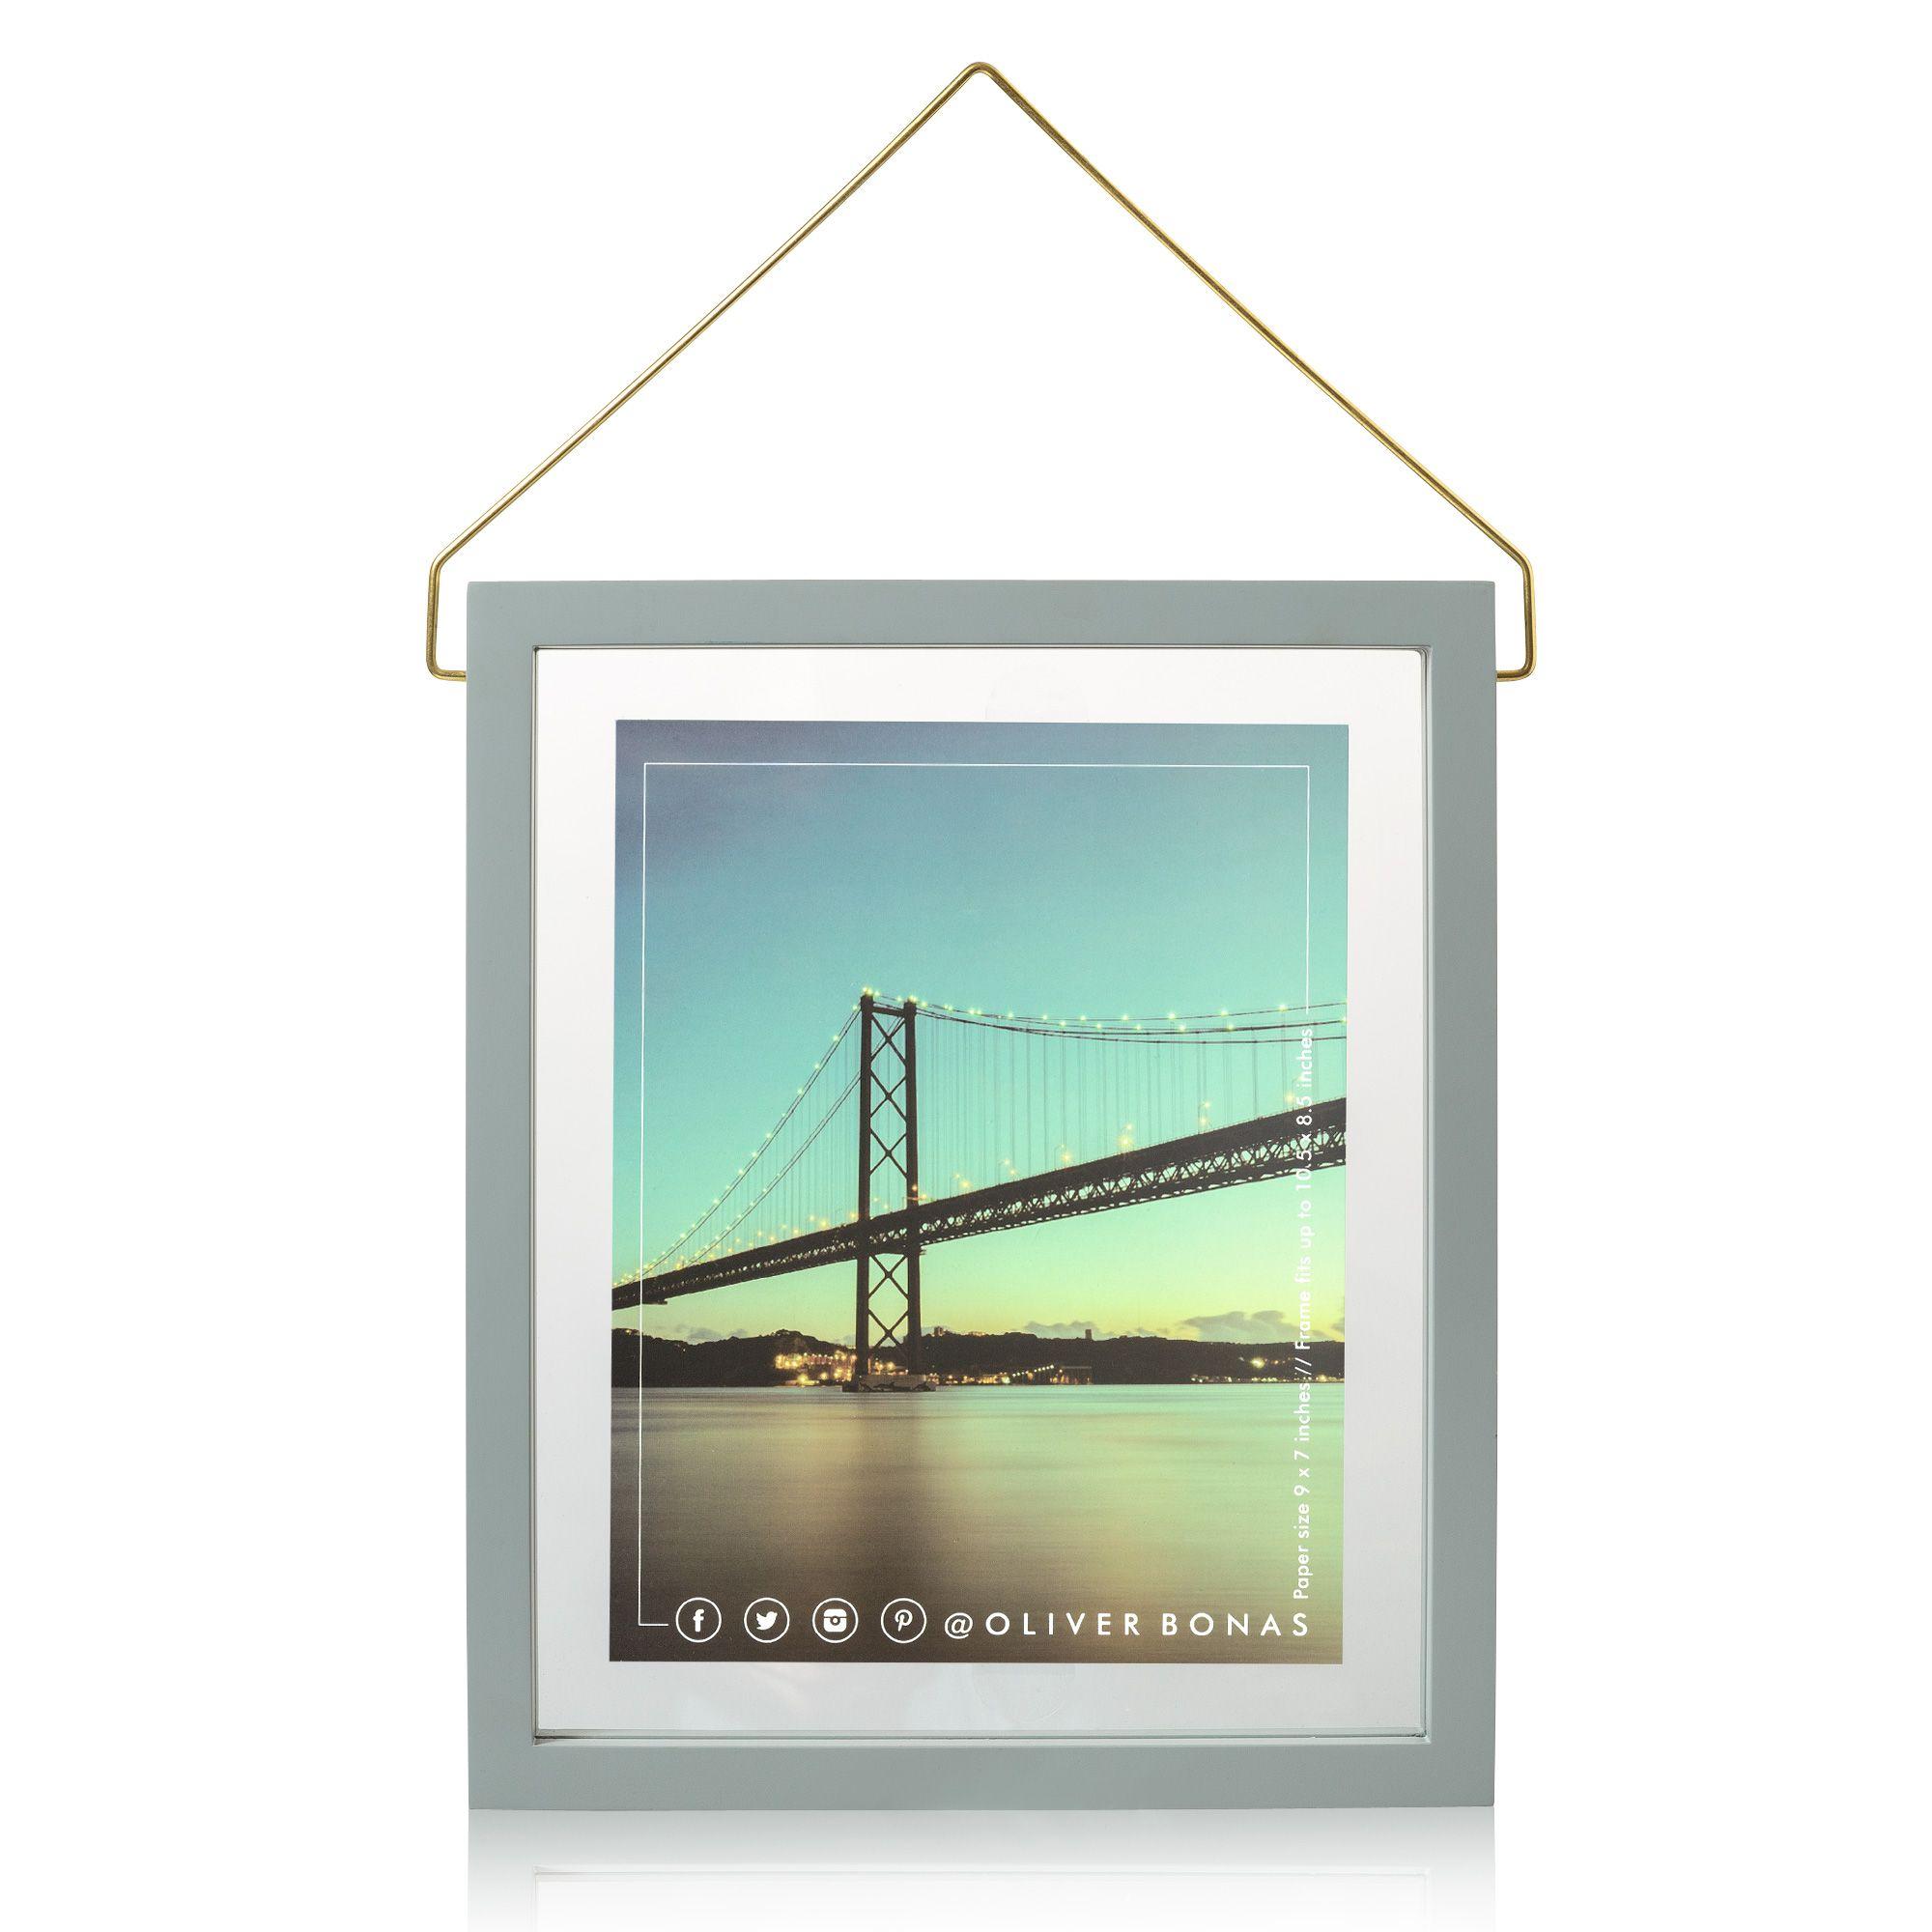 Buy the Extra Large Loft Hanging Floating Frame at Oliver Bonas ...